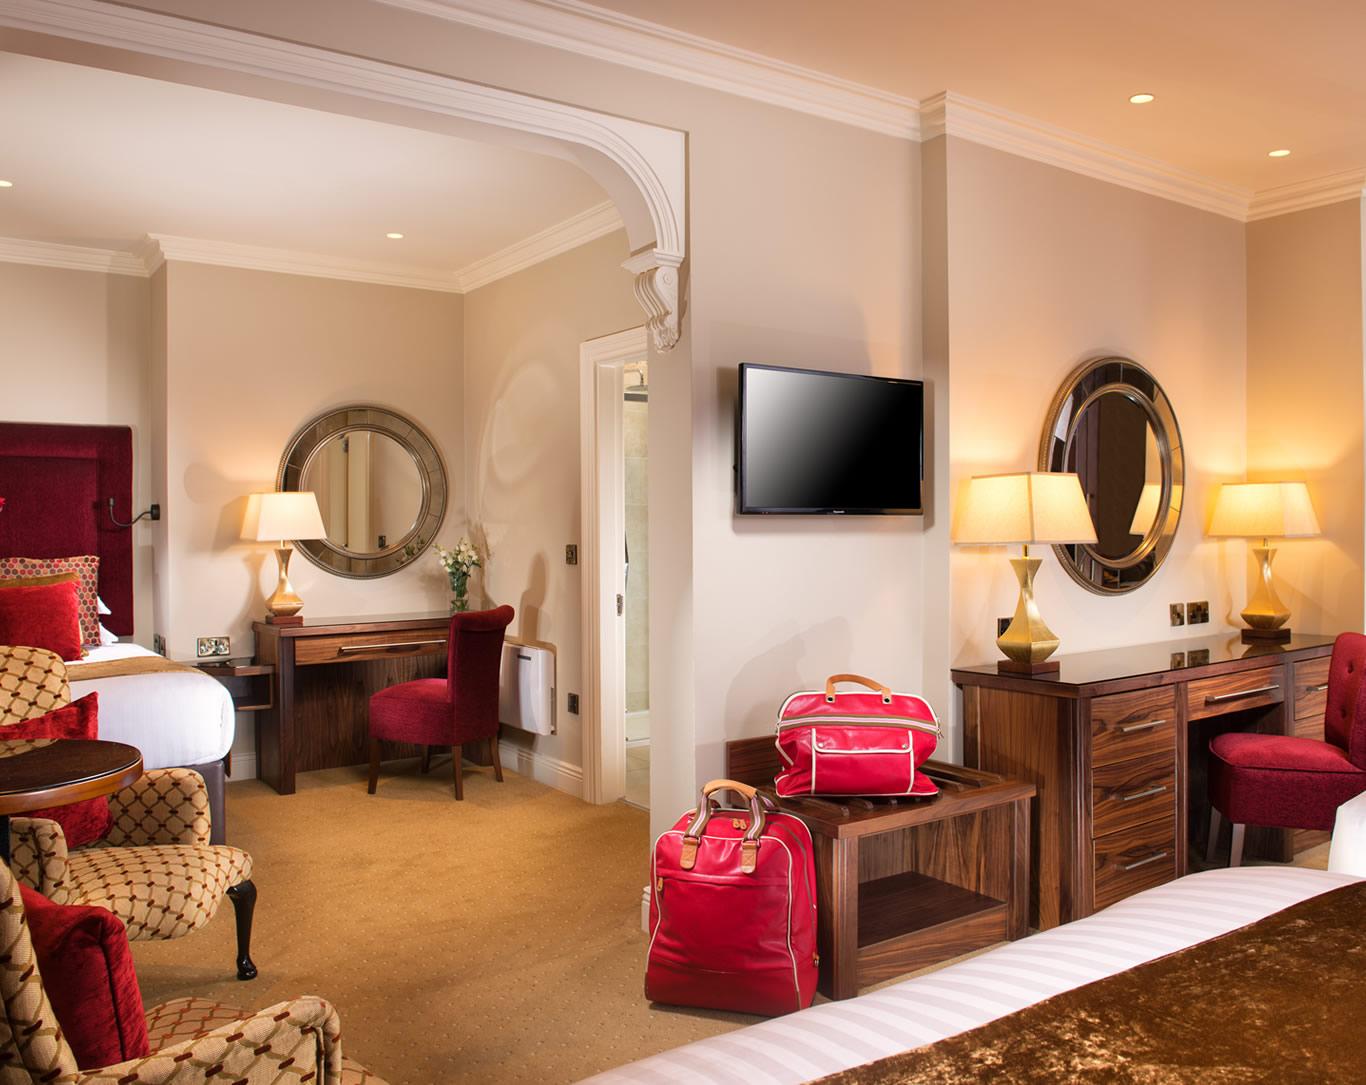 48-2-opt | Executive Rooms